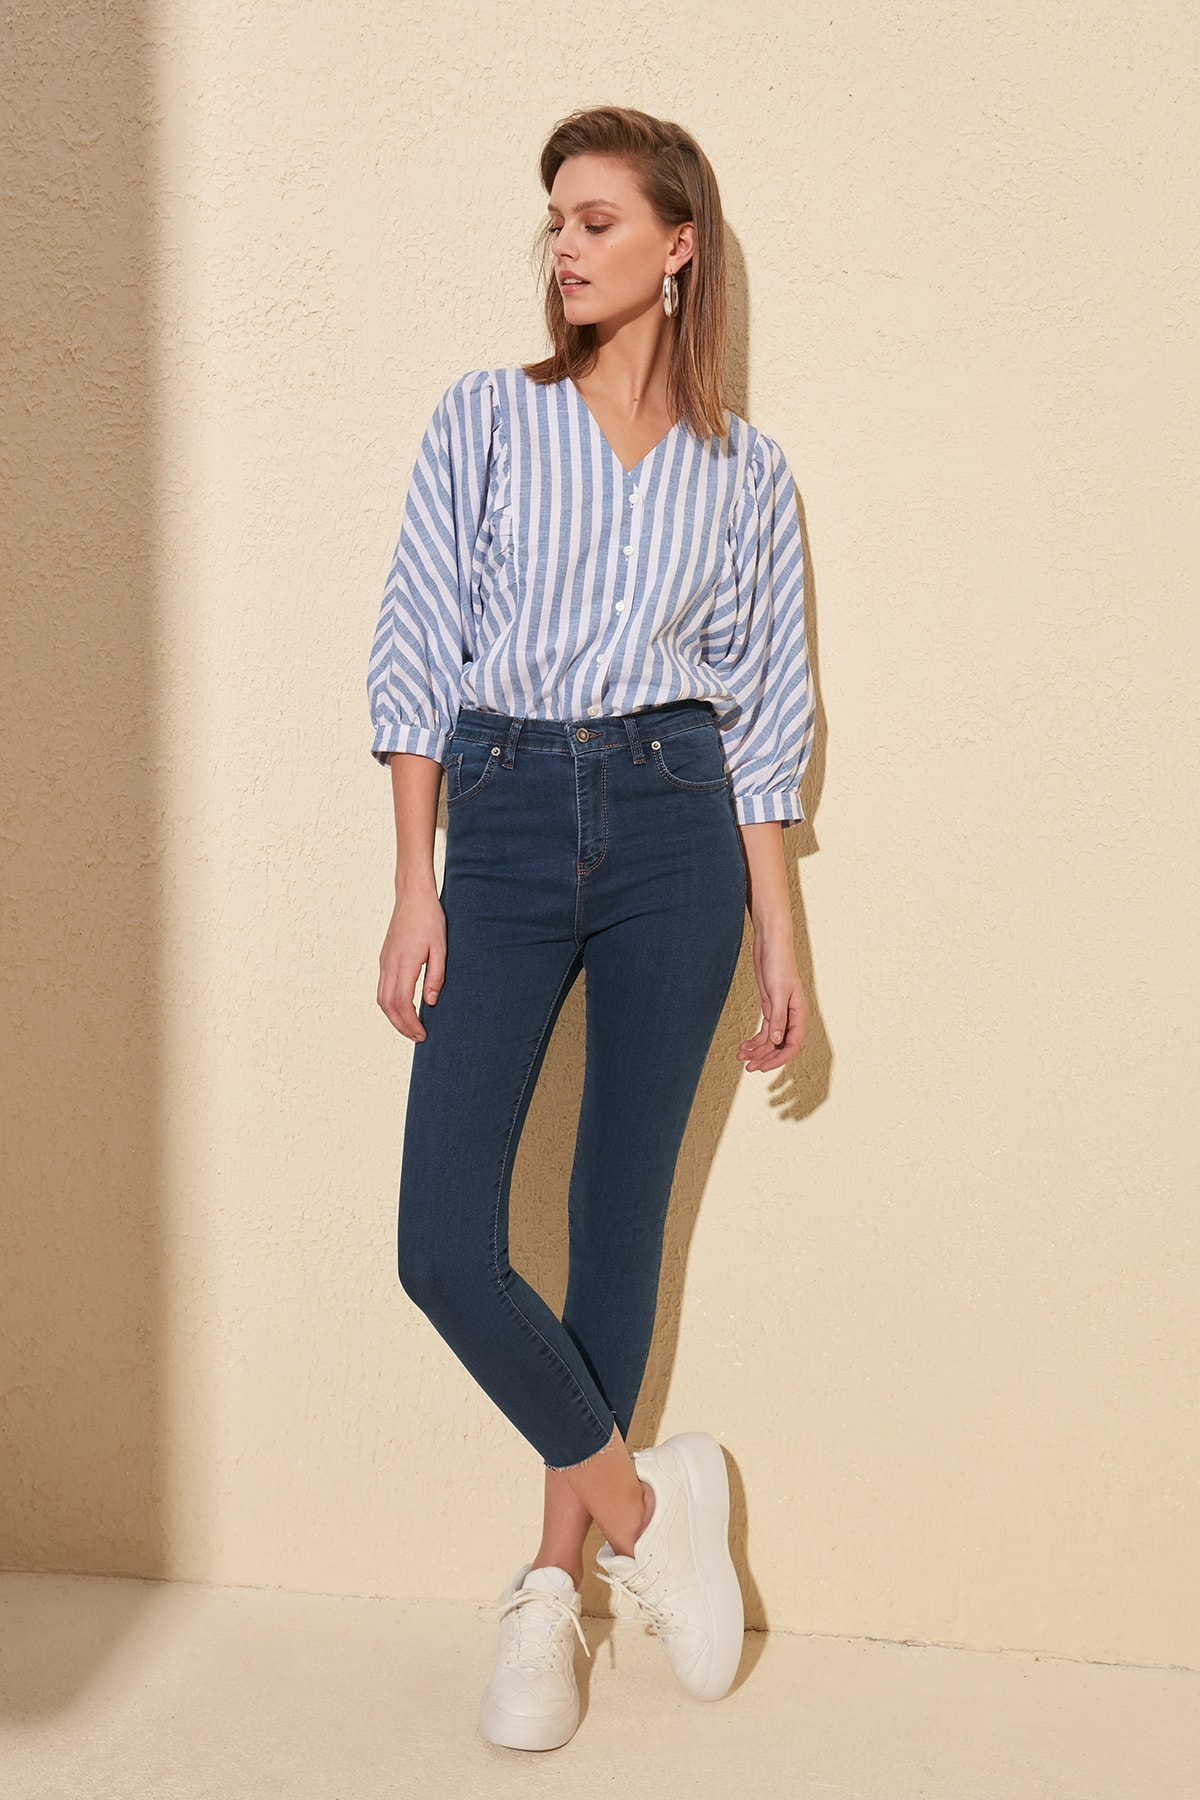 Trendyol Pettitoes Discrete High Waist Skinny Jeans TWOSS20JE0300